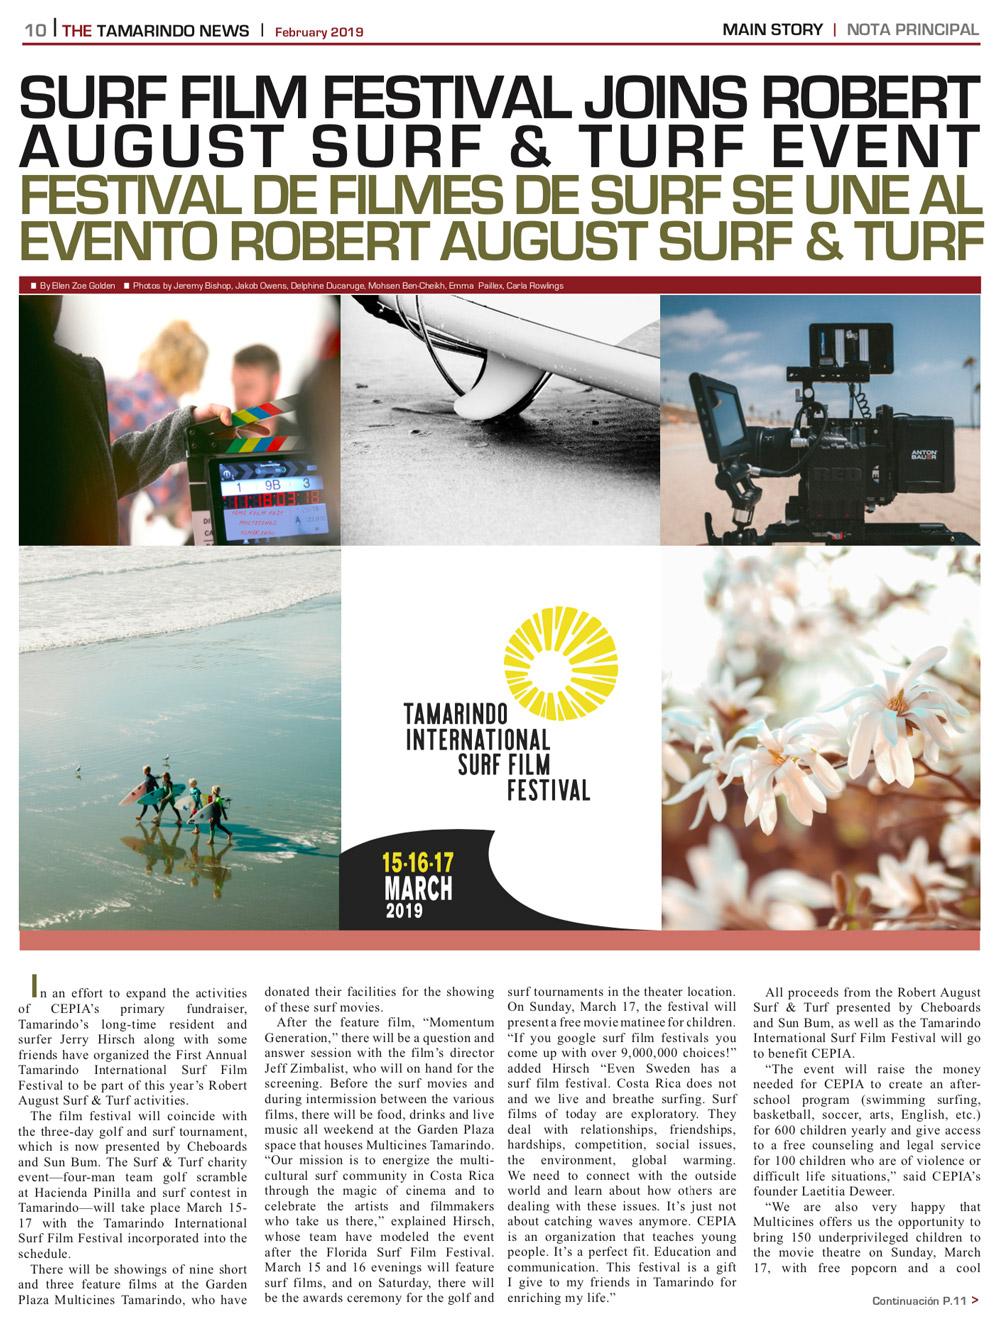 Tamarindo-News-Film-Festival-6.jpg